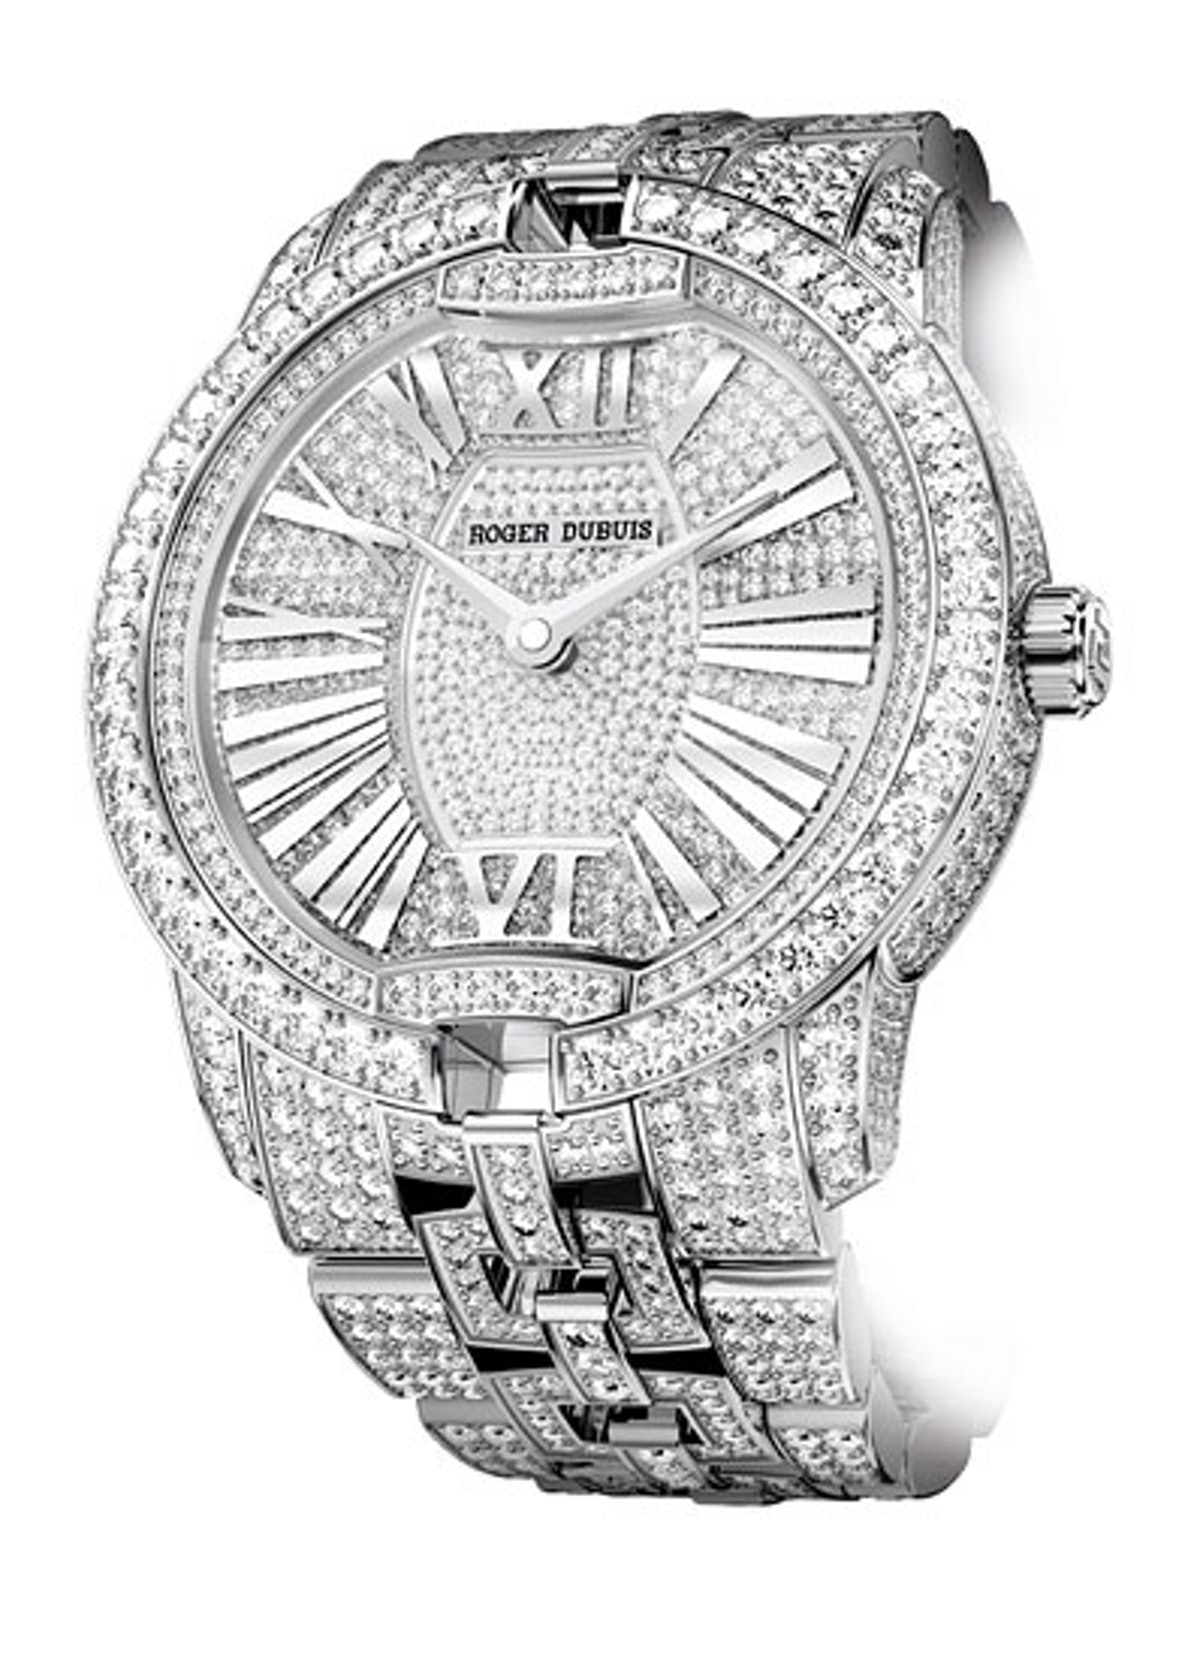 acss-geneva-watches-09-v.jpg